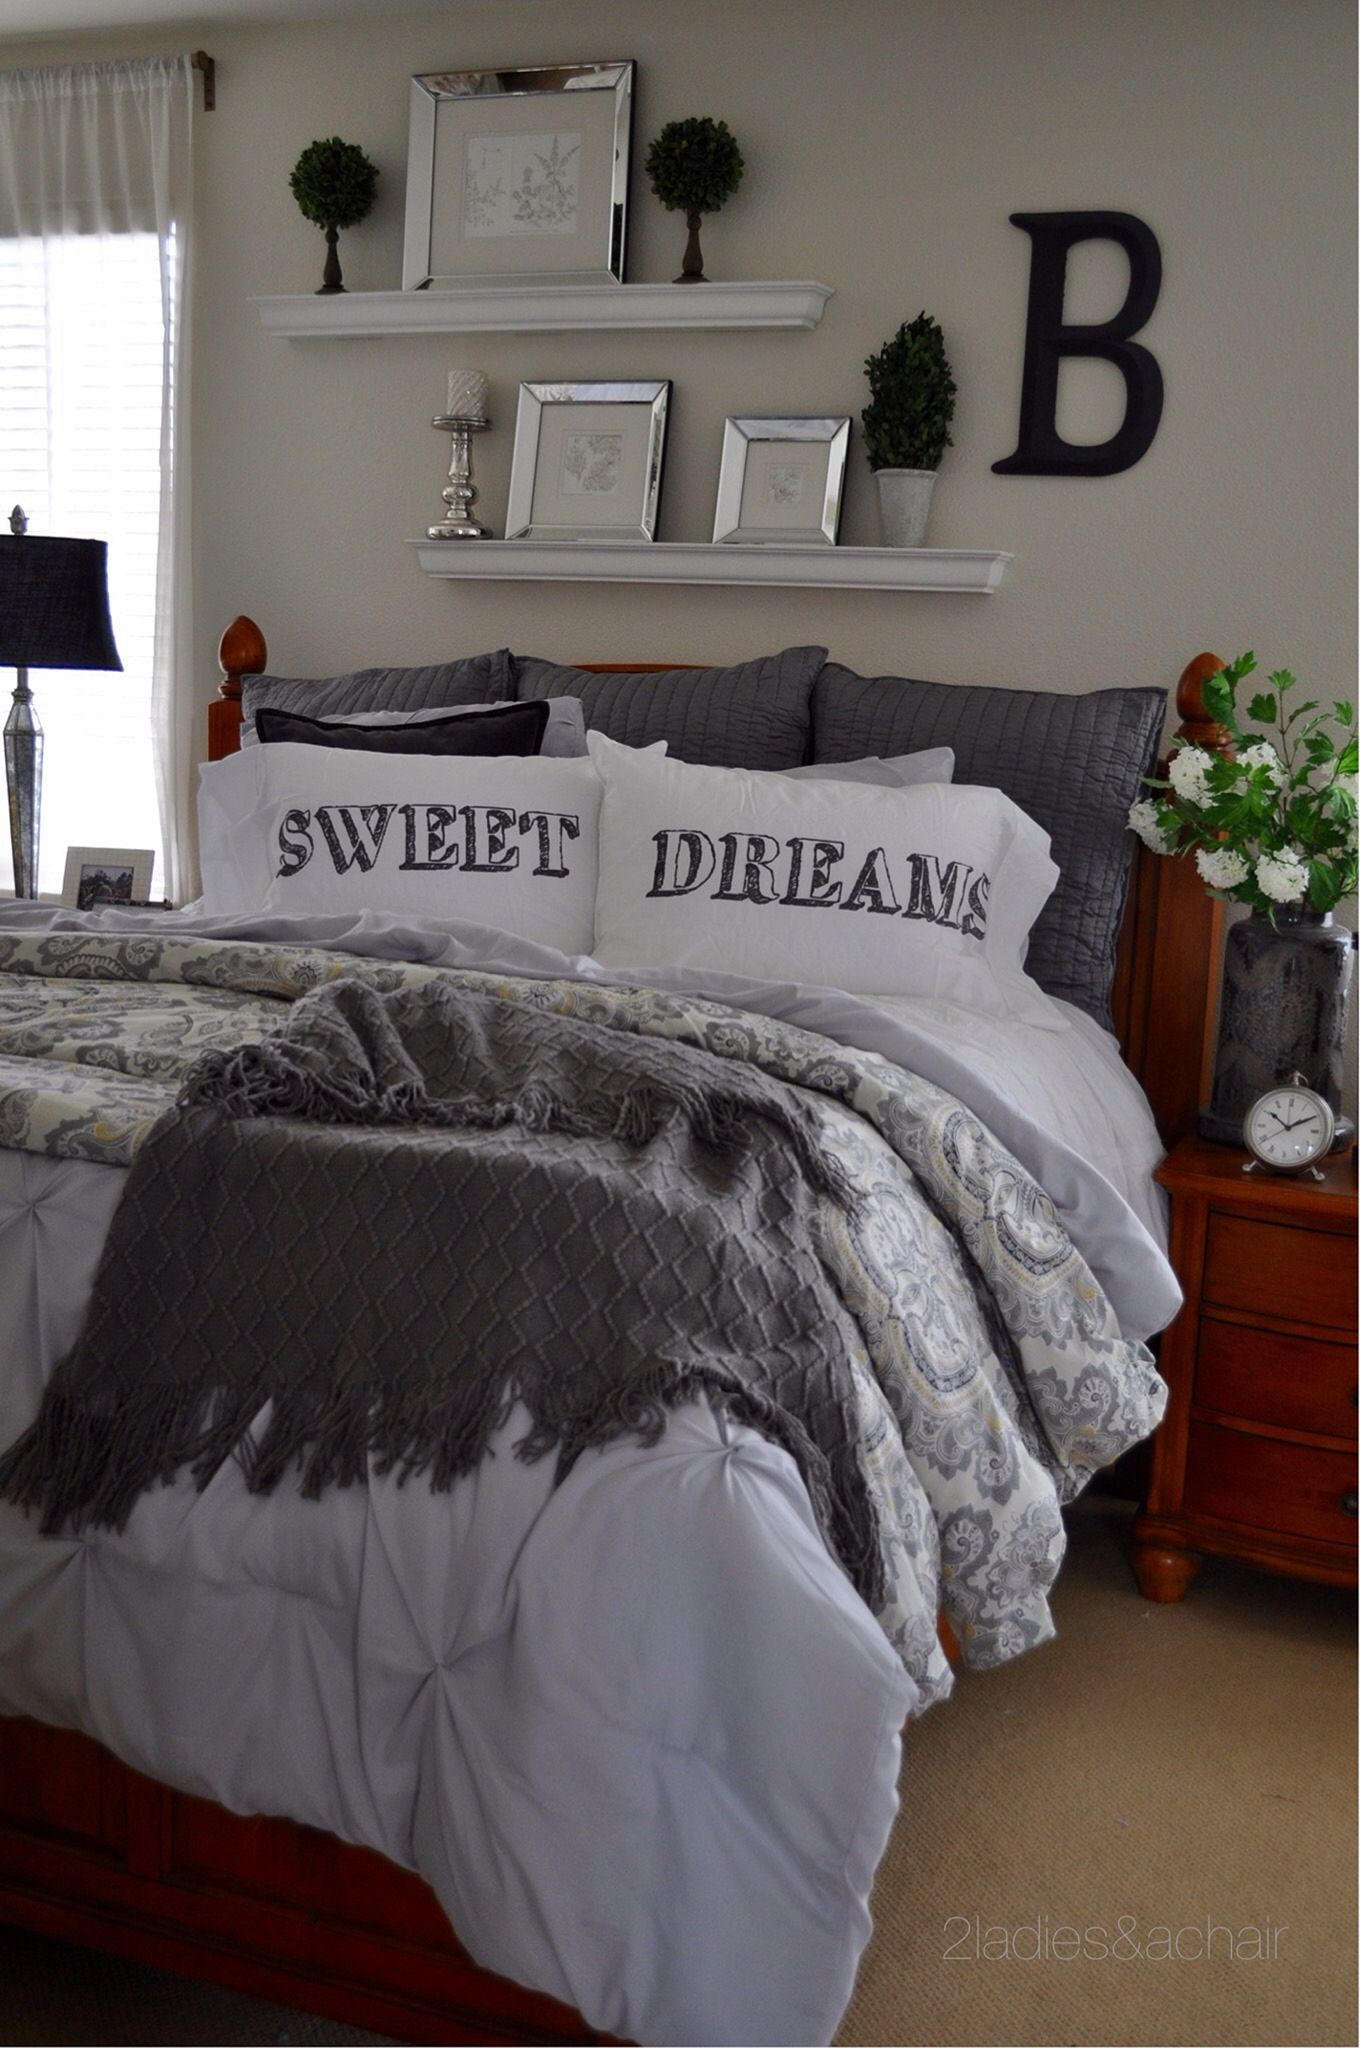 20 Cozy Home Interior Design Ideas: 20+ Cozy Small Bedroom Design And Decorating For